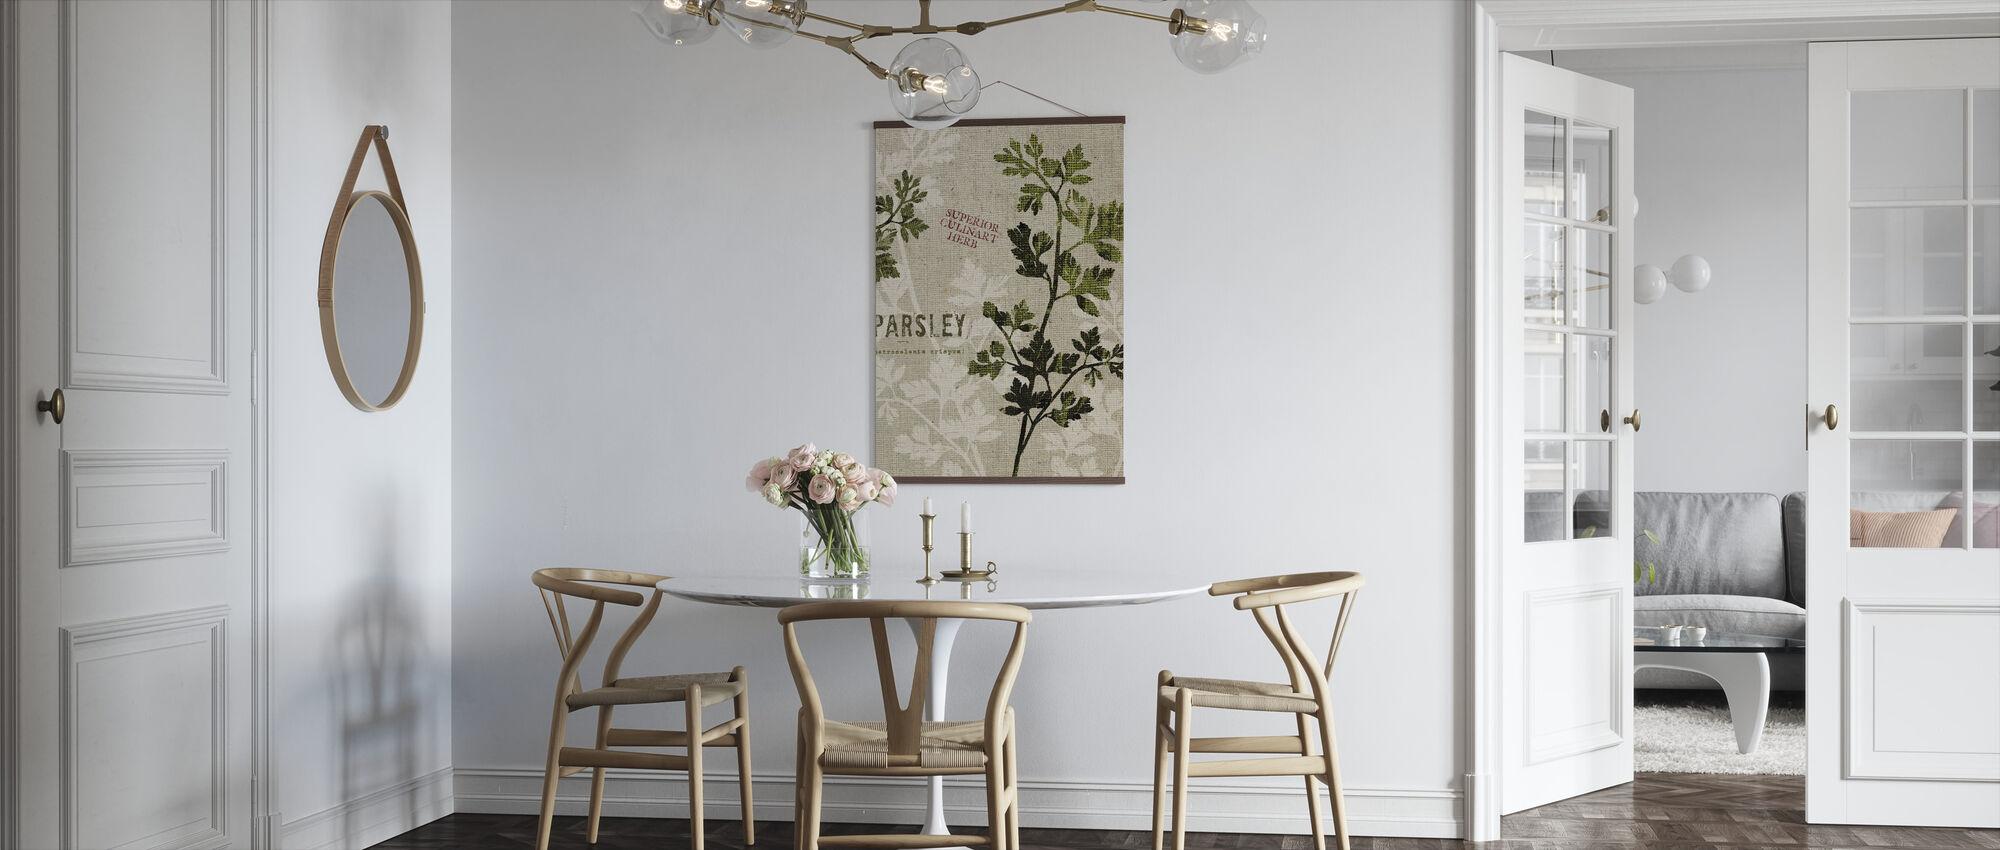 Organic Parsley - Poster - Kitchen